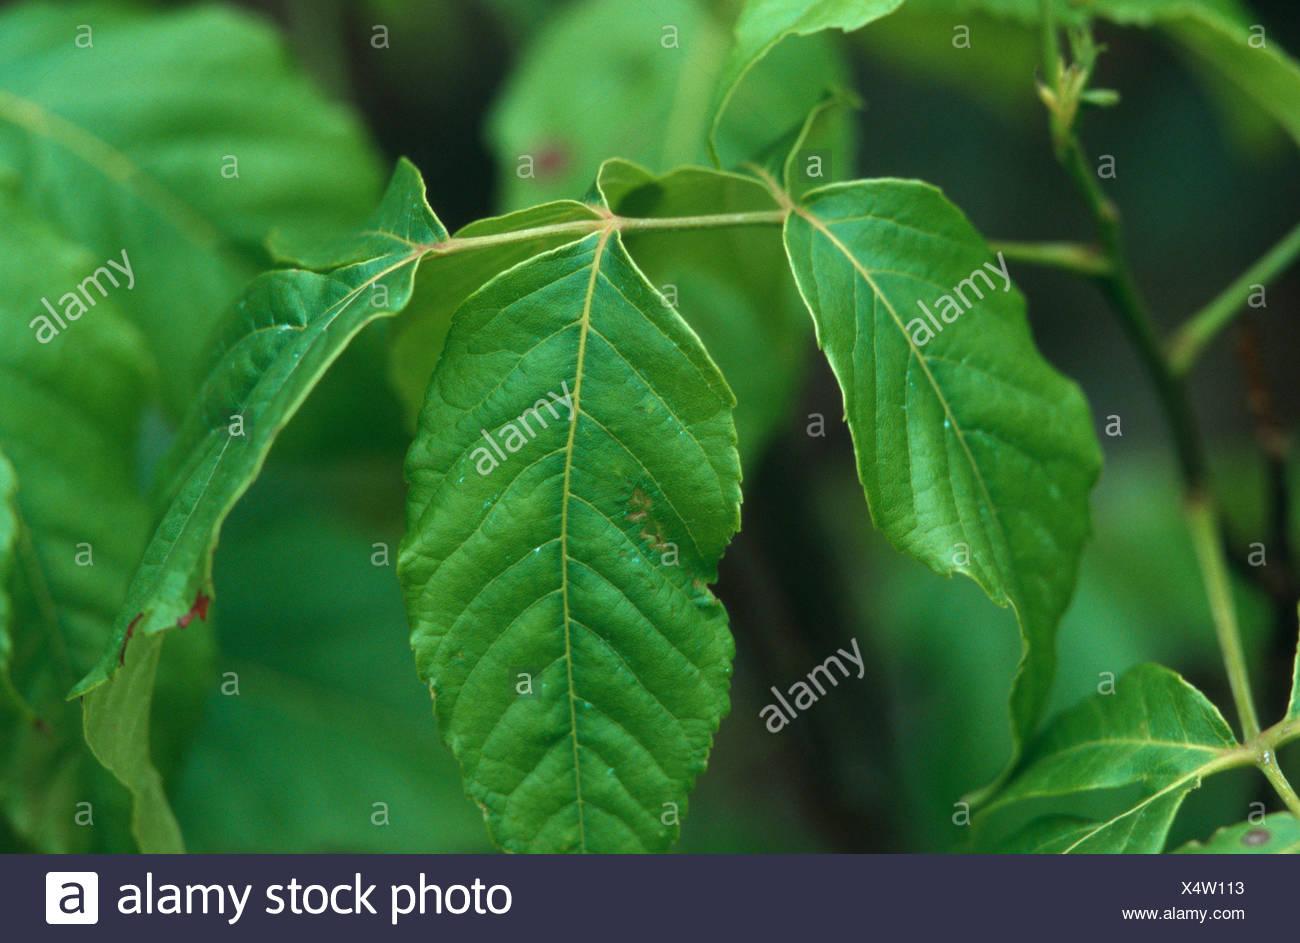 texan buckeye (Ungnadia speciosa), leaf - Stock Image